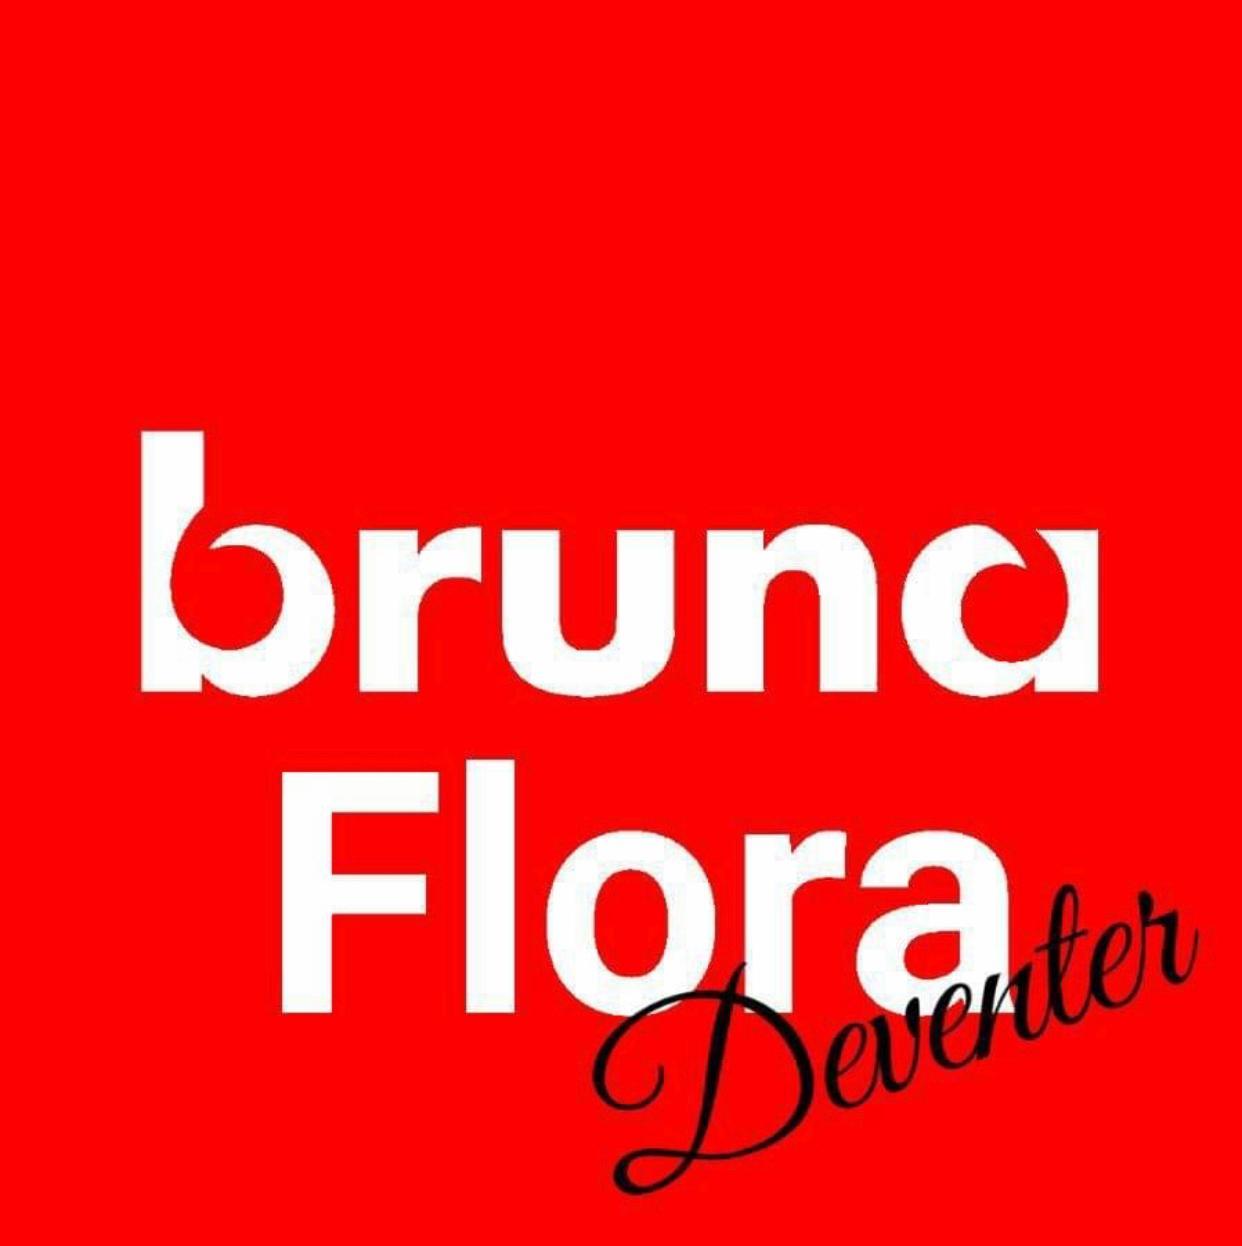 Bruna Colmschate & Deventer